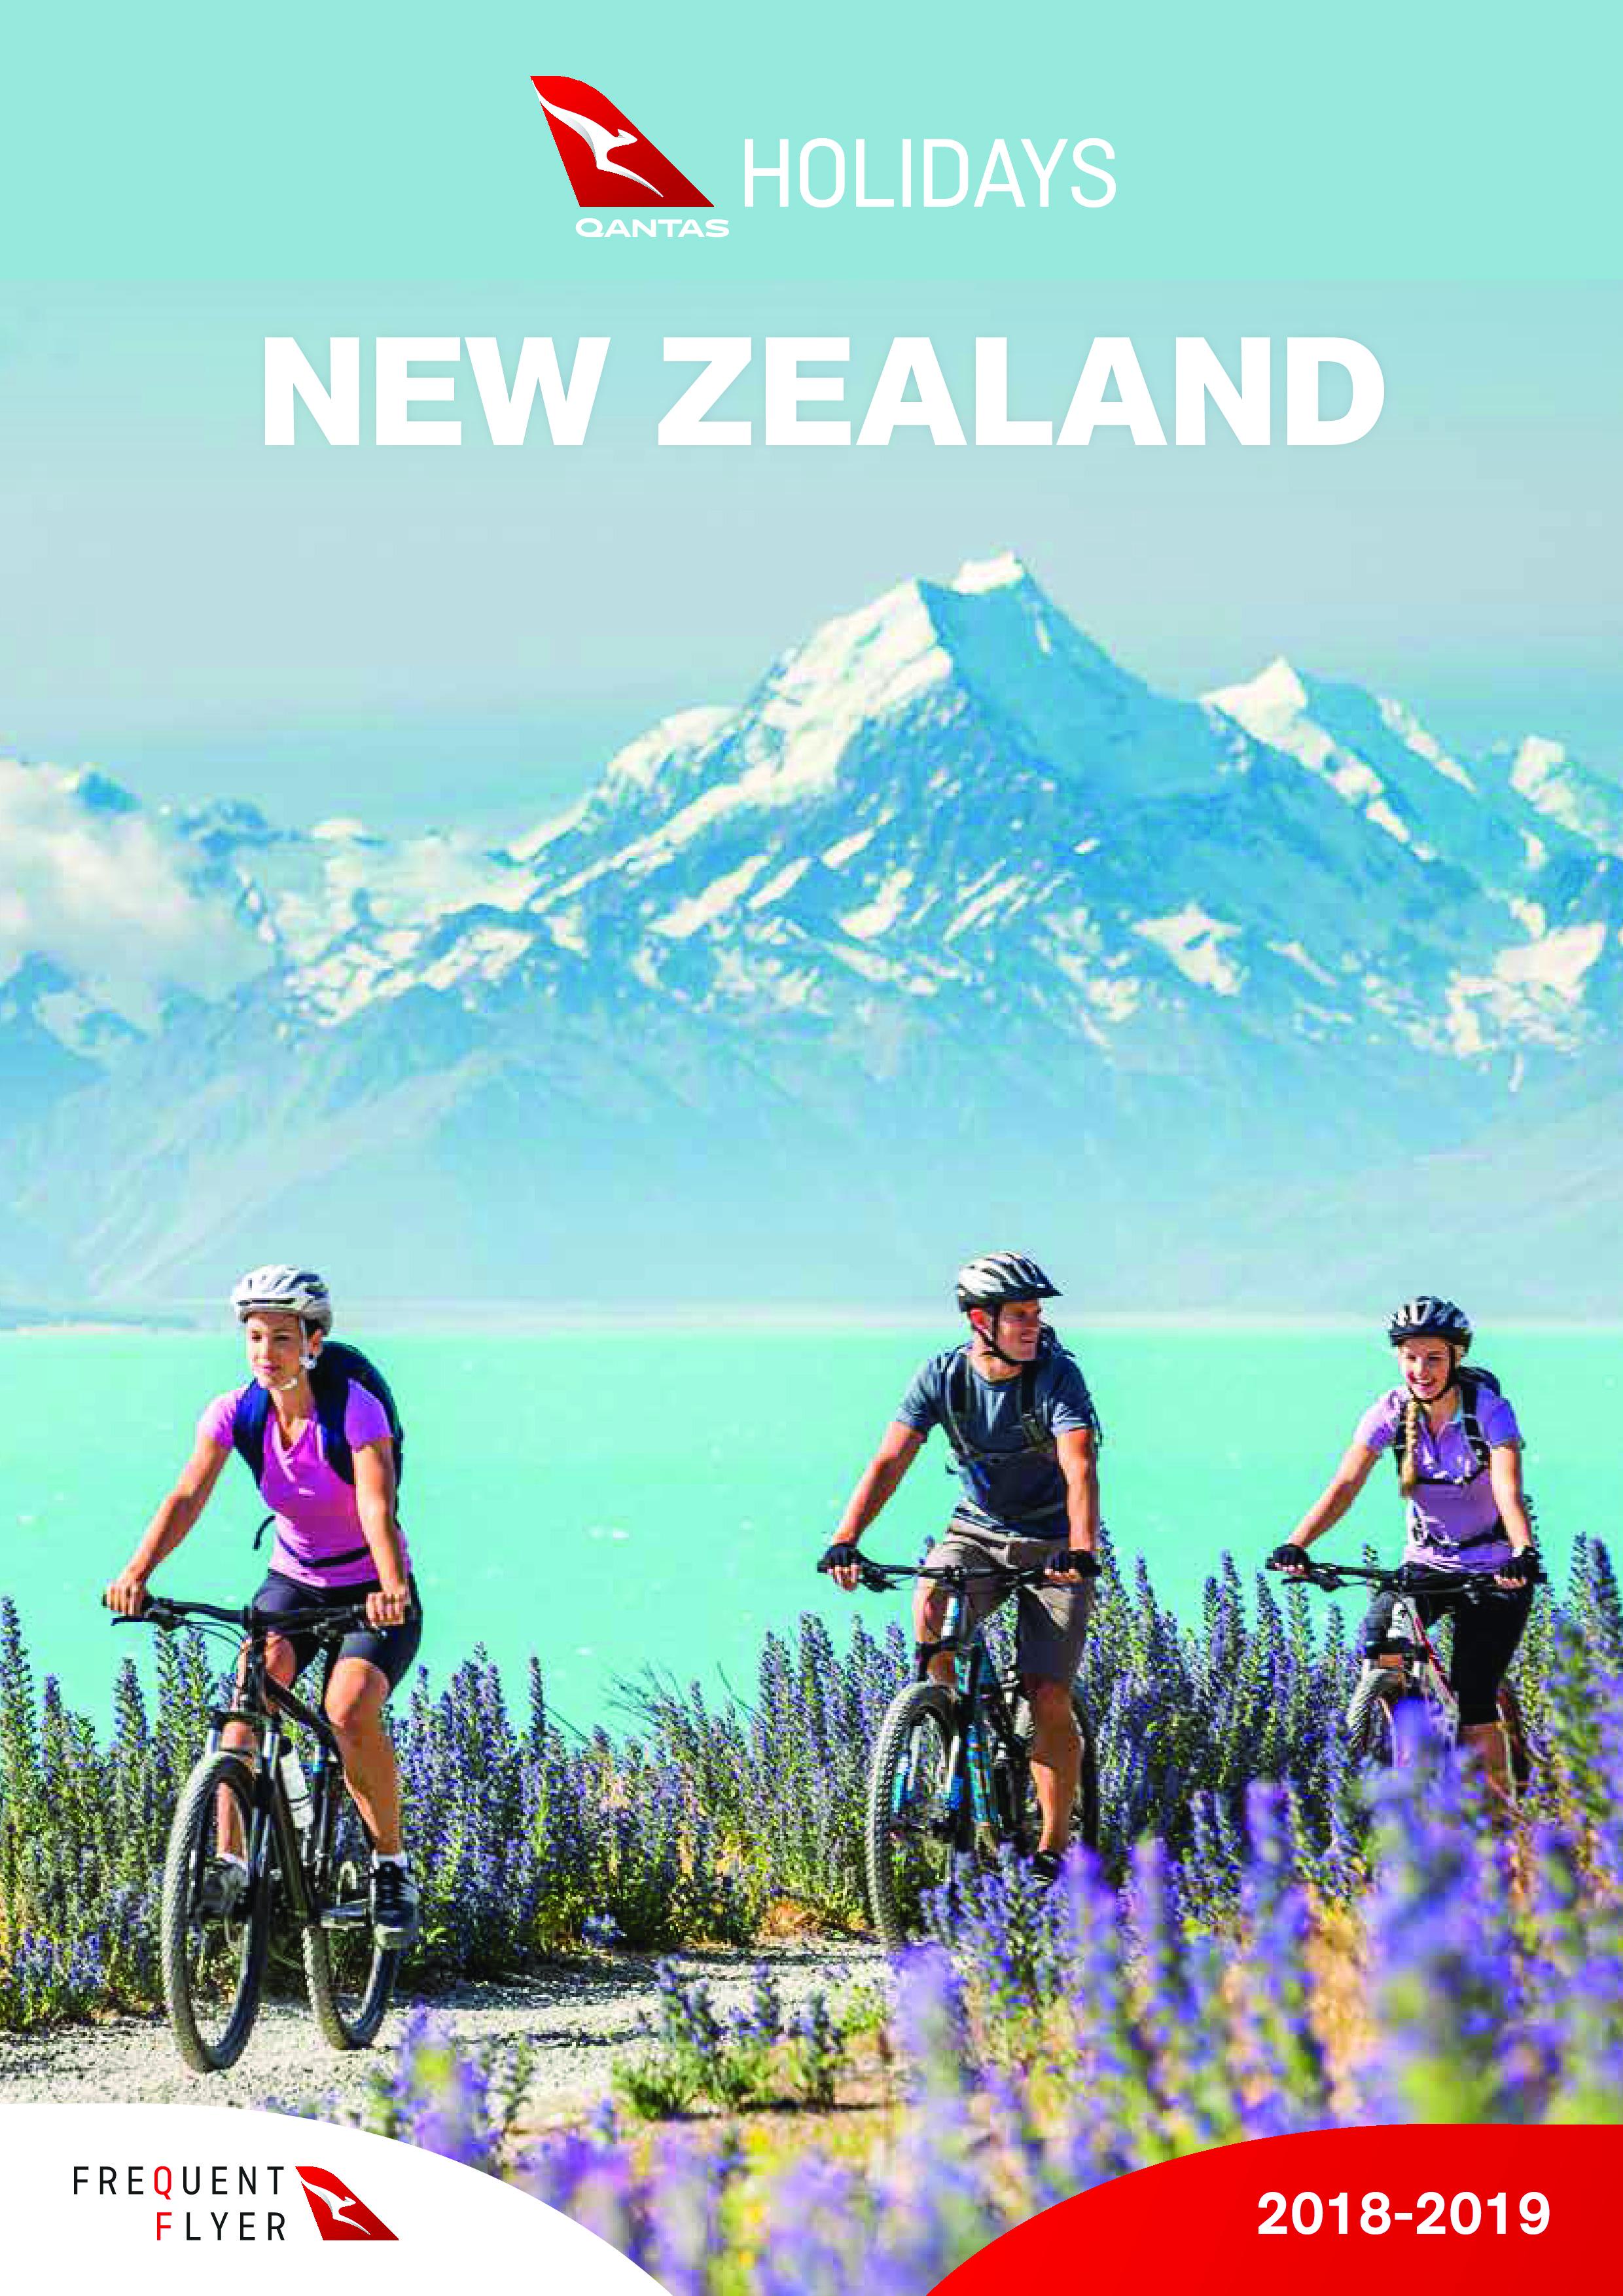 NEW ZEALAND-page-0.jpg